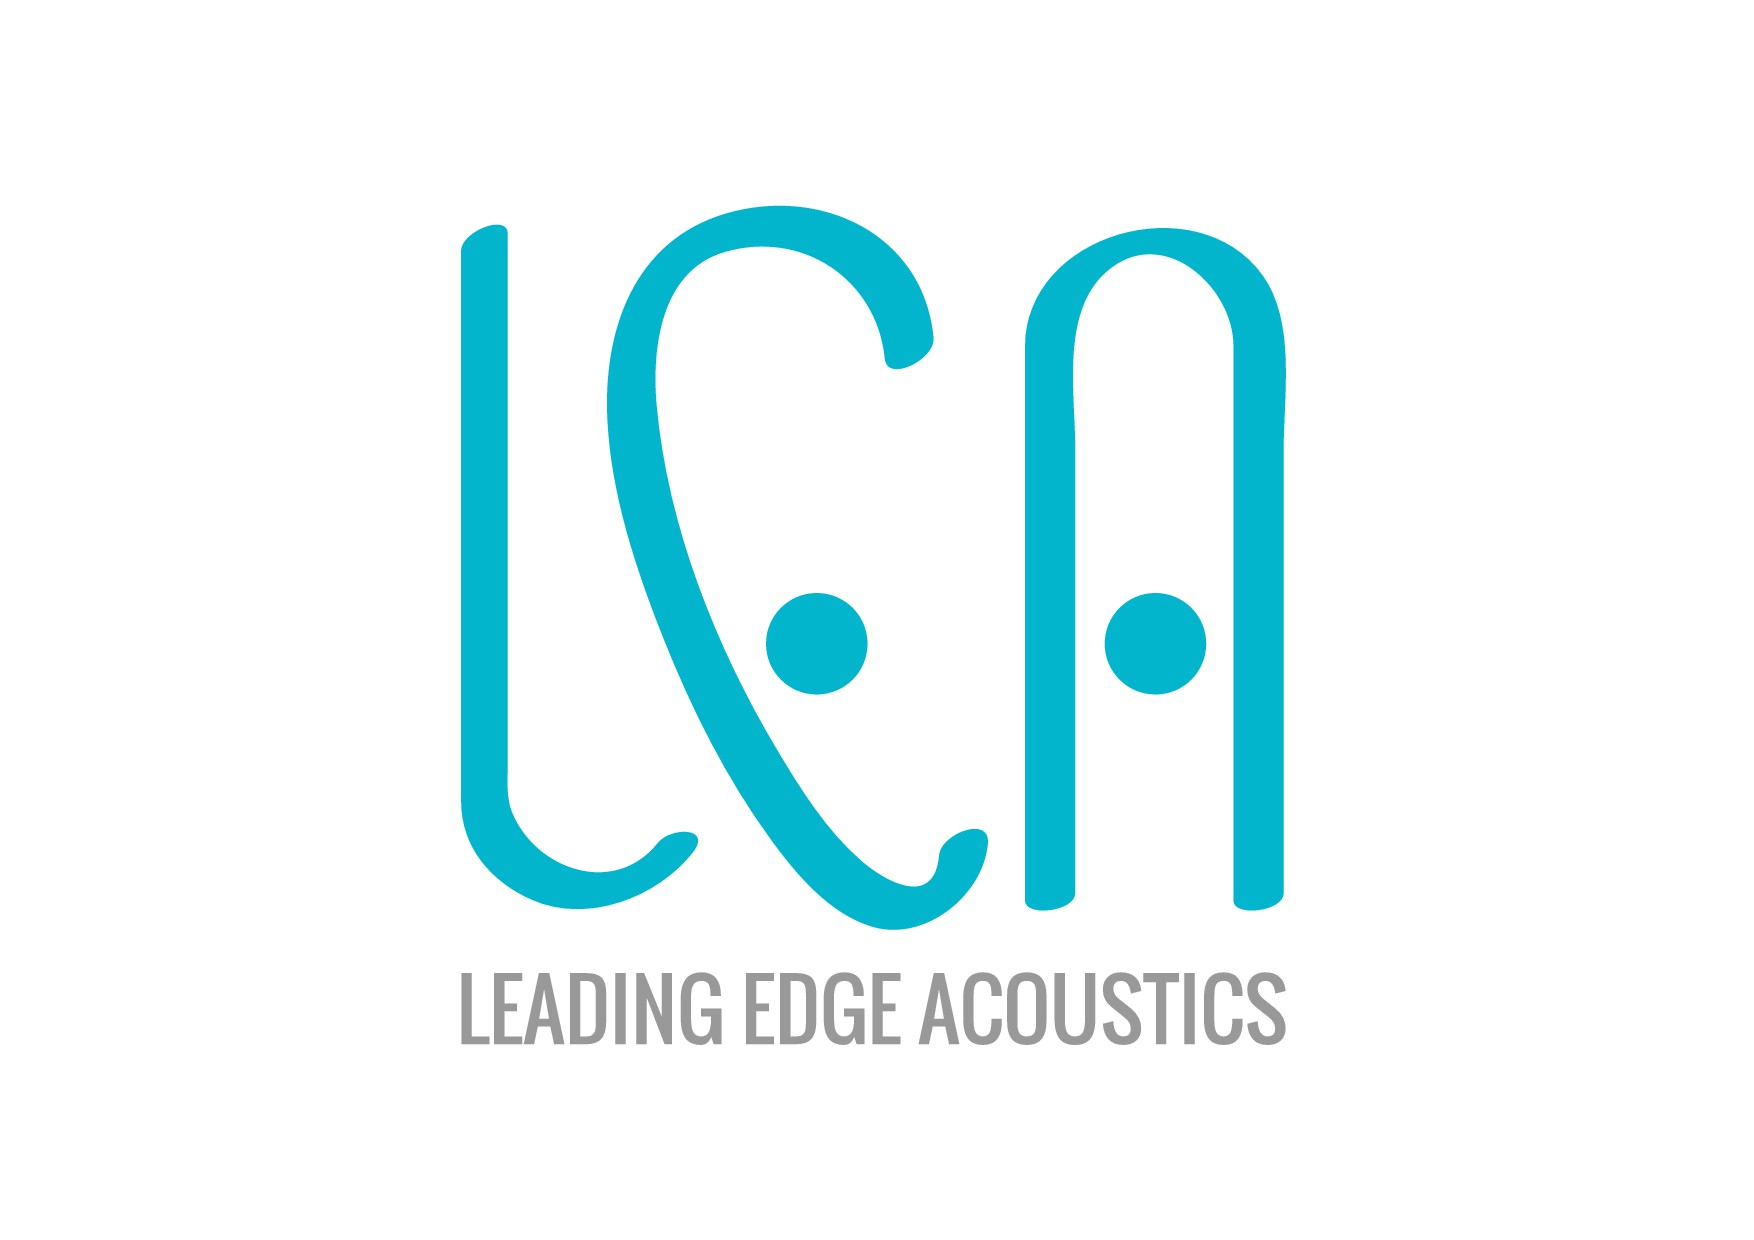 Design a logo that can be heard